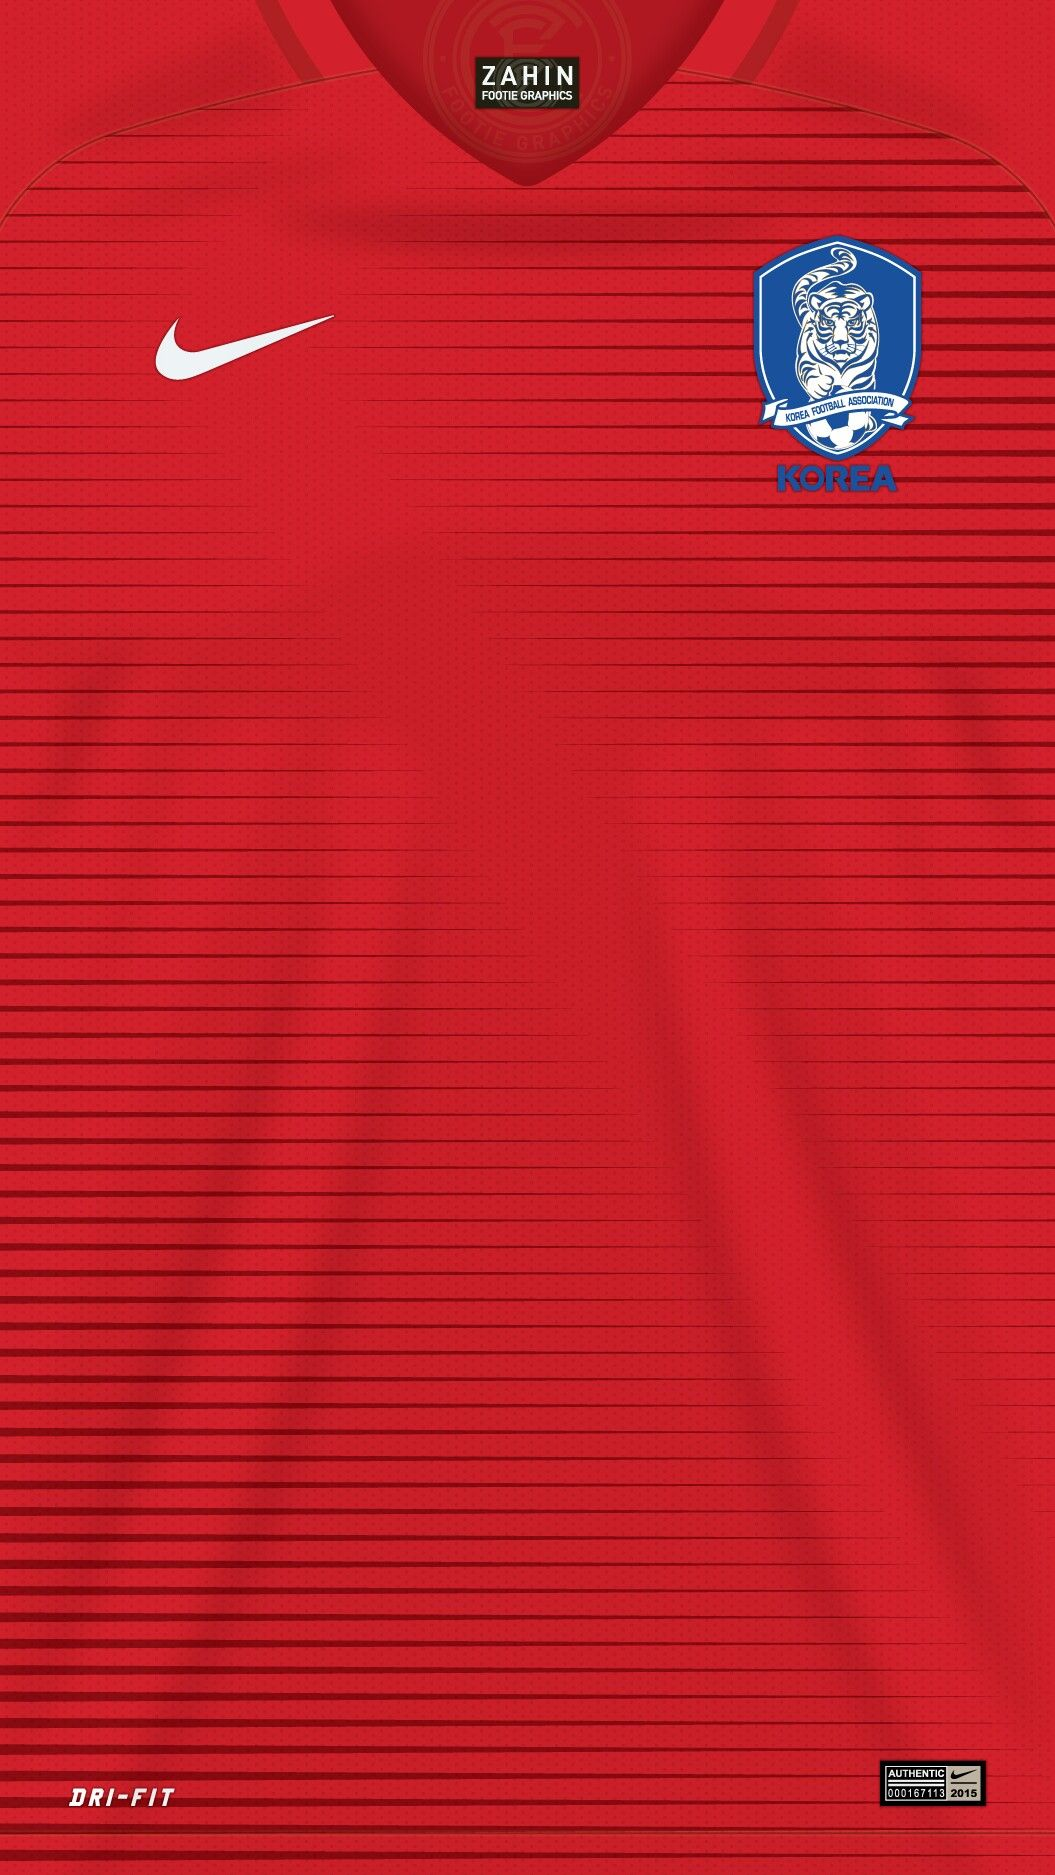 Pin De Sakthisuriya Em Soccer Kits Camisas De Futebol Camisa De Futebol Kits De Futebol